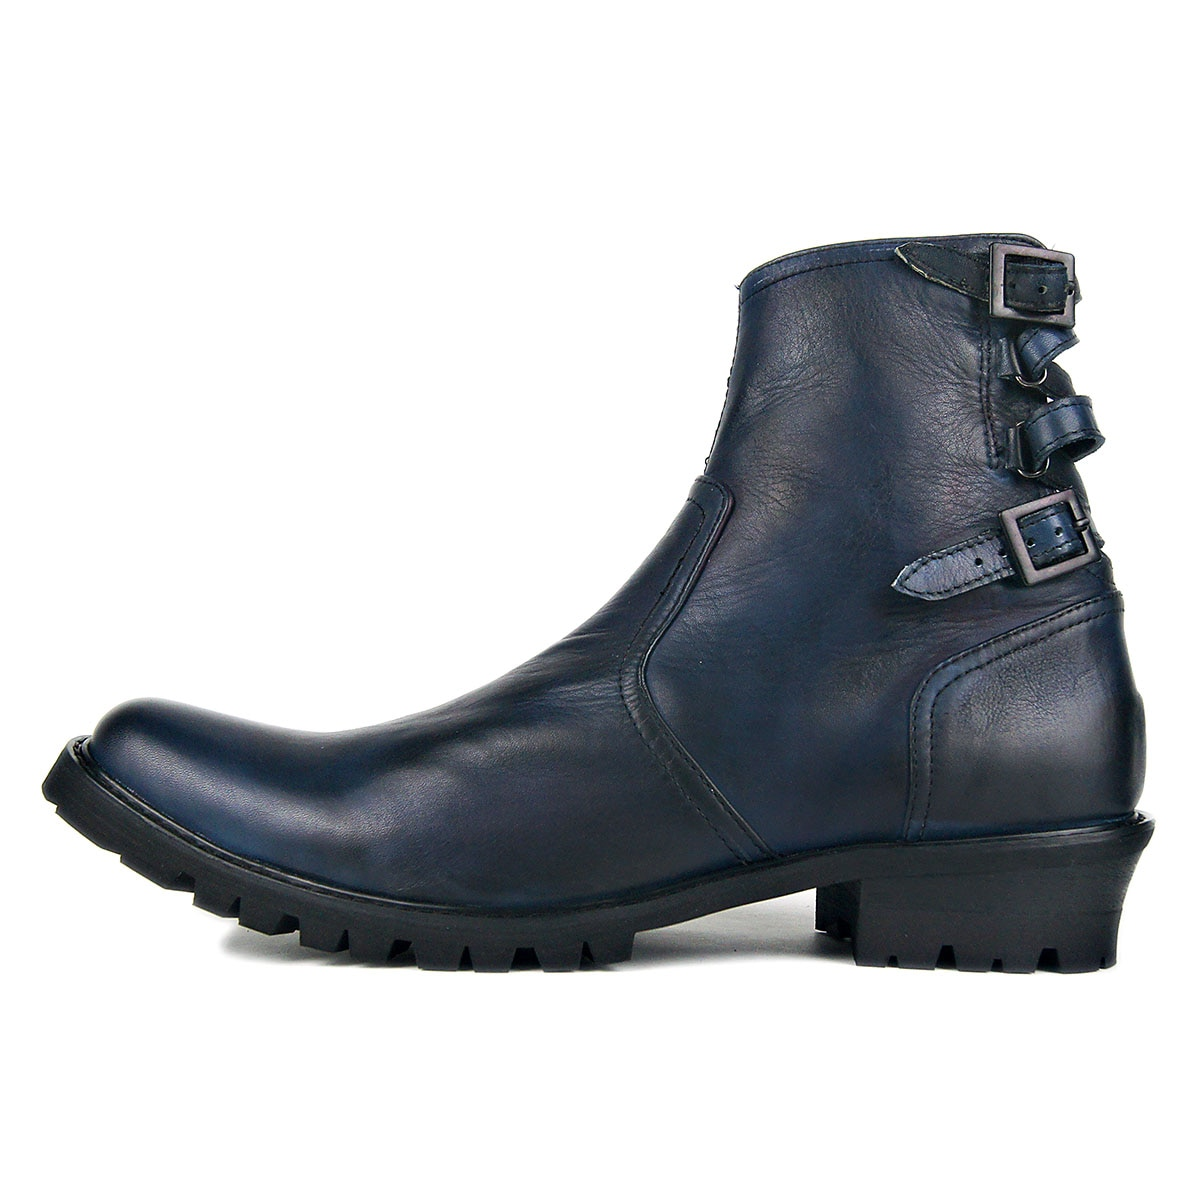 OTTO-أحذية تشيلسي أصلية من جلد البقر chukka للرجال ، أحذية بسحاب ، أحذية على الطراز البريطاني ، عصرية ، جديدة ، مبيعات ساخنة